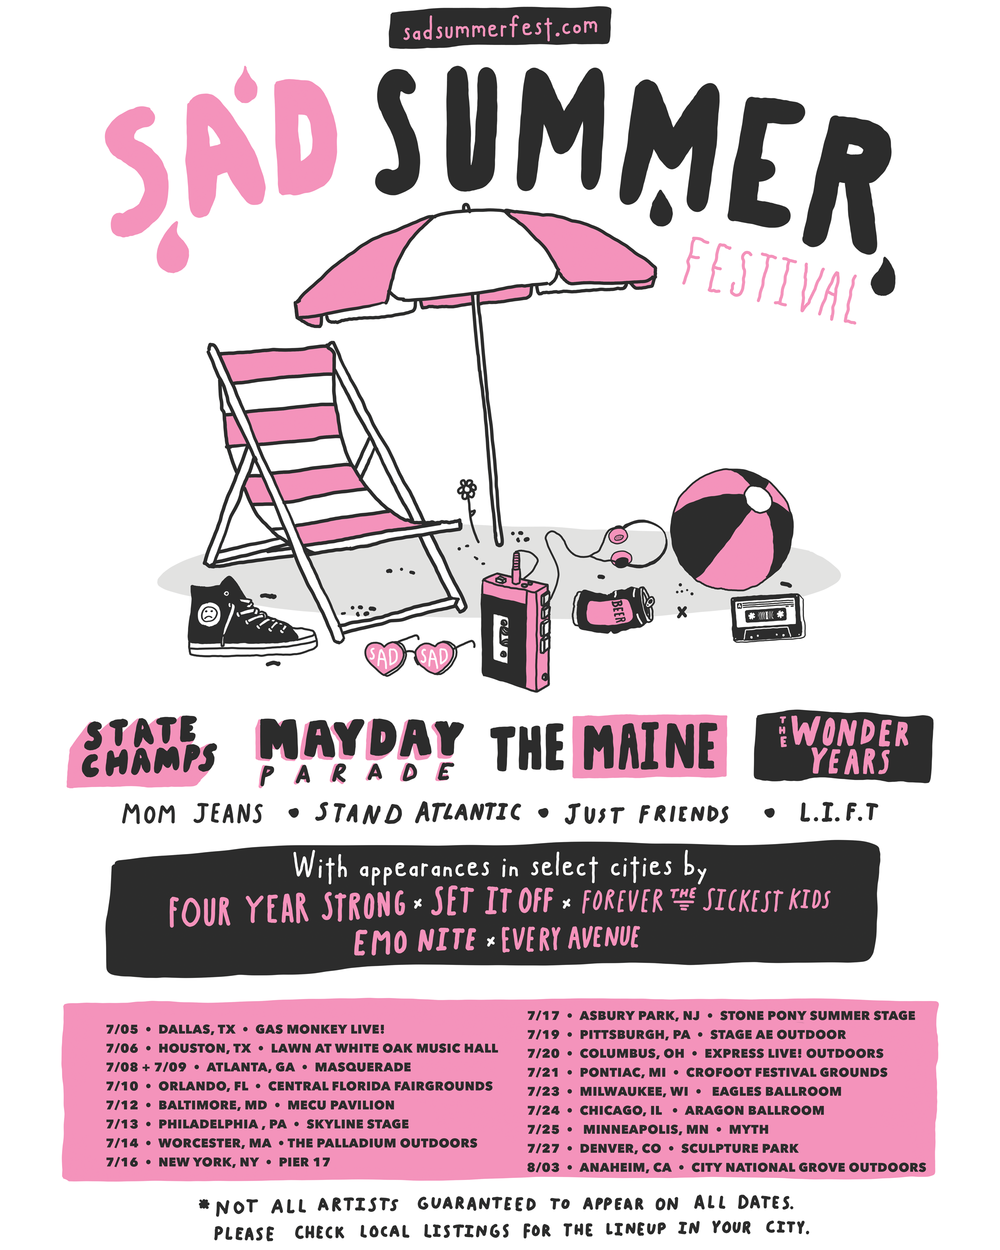 Sad-Summer-Fest---Admat-(web-final).png